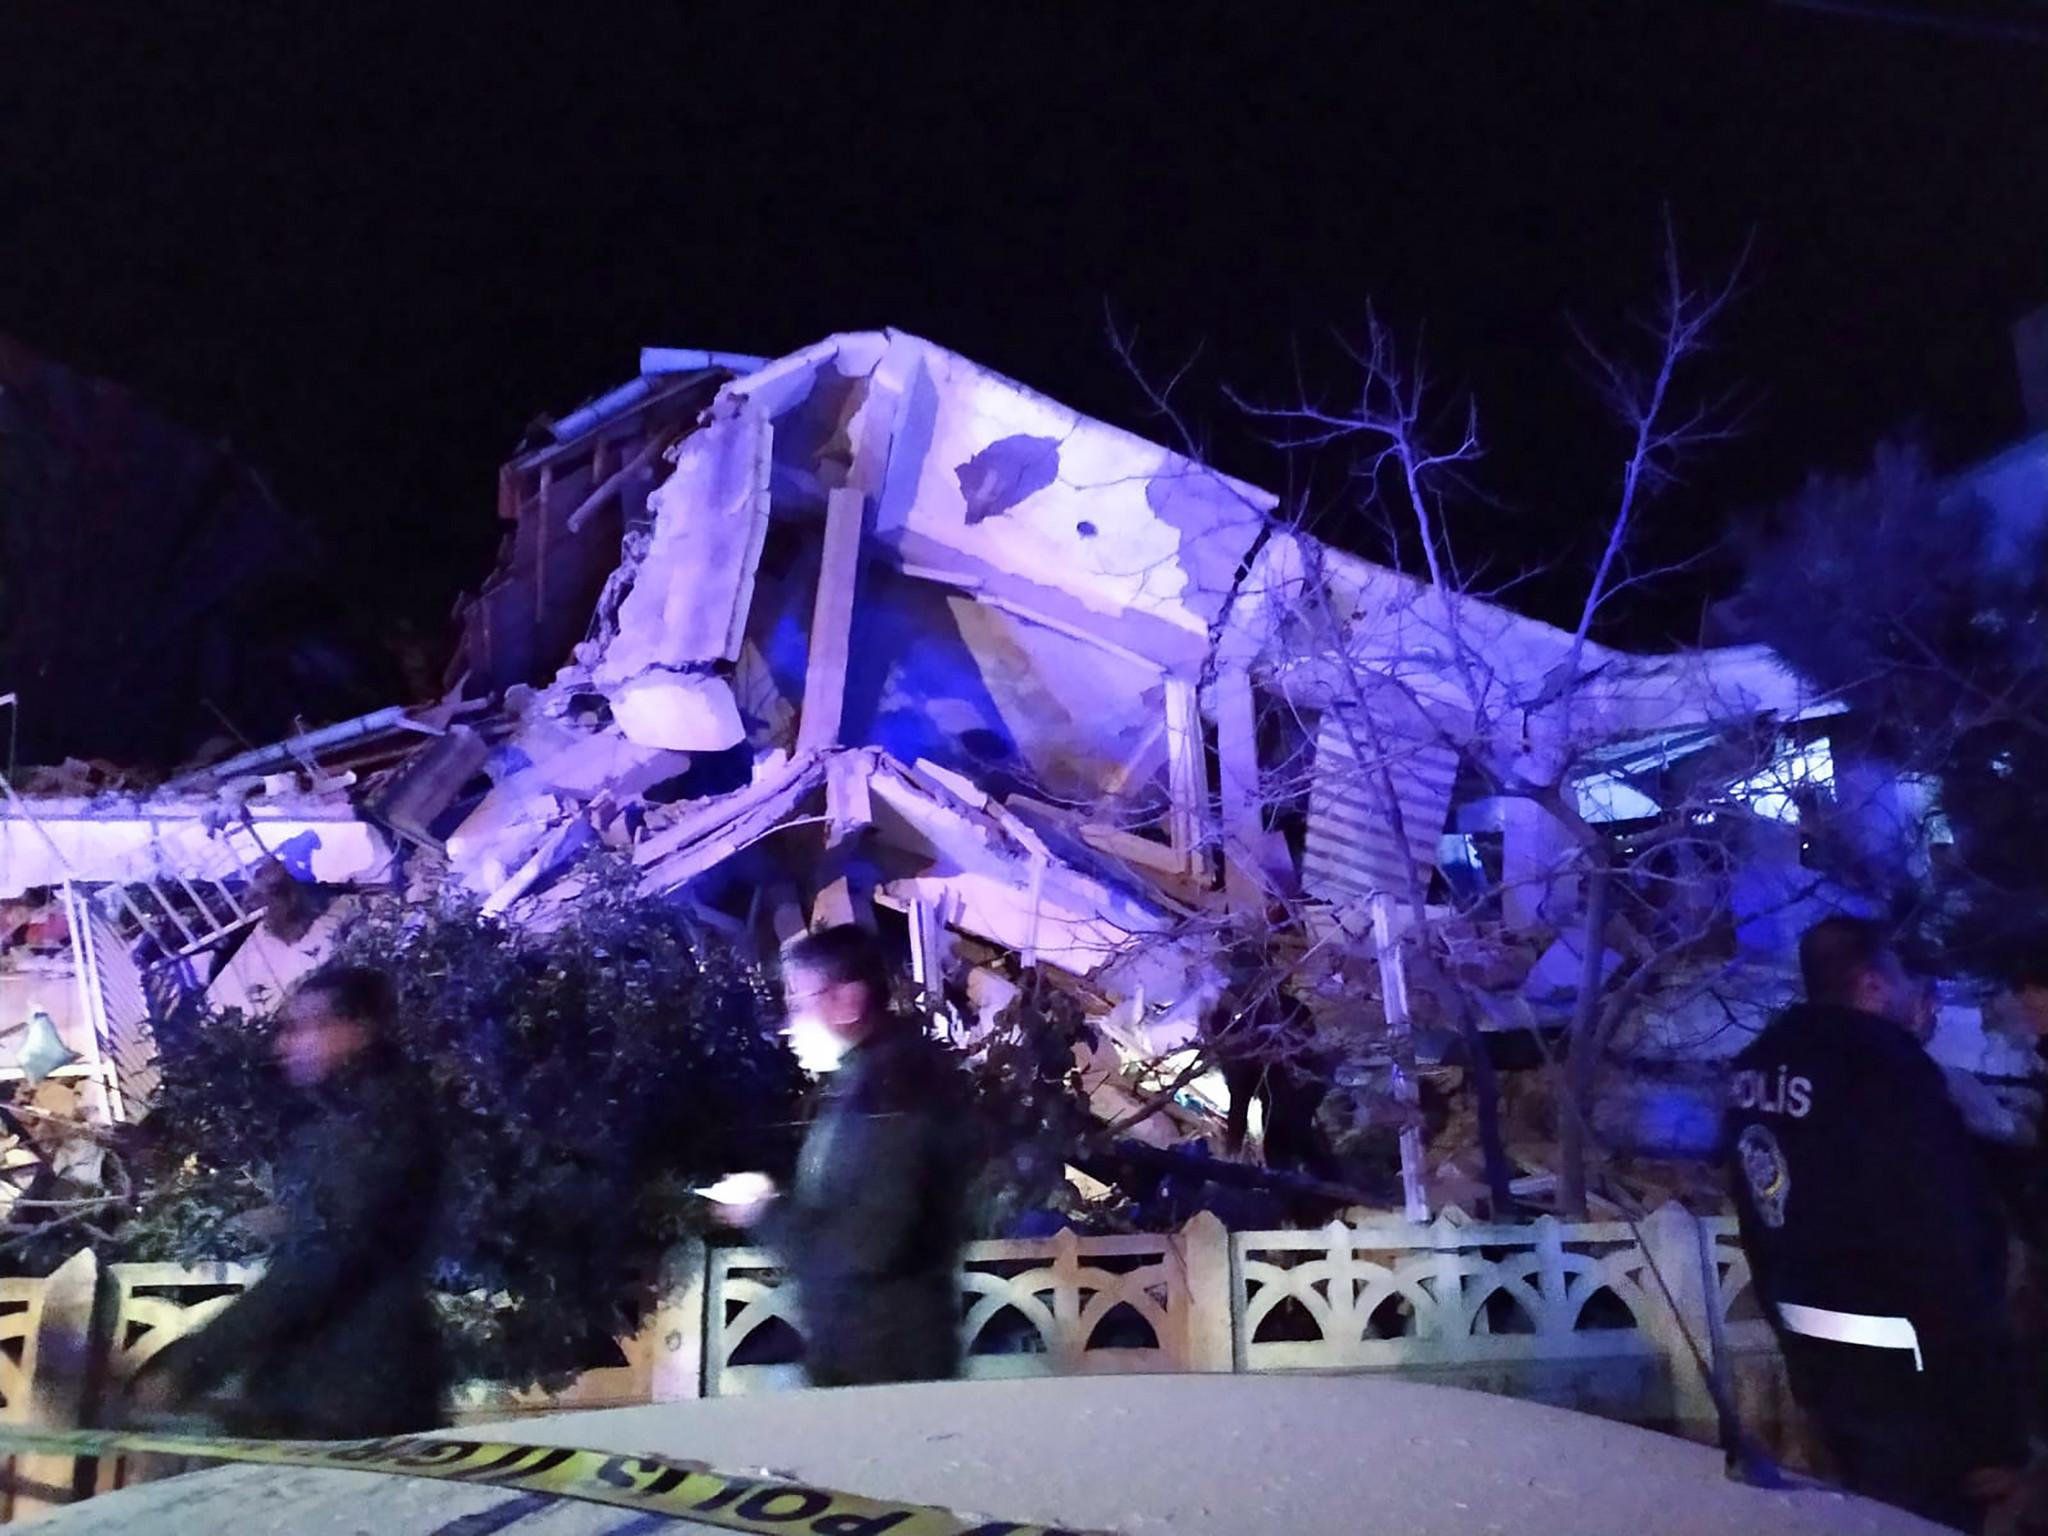 Powerful 6.7-magnitude earthquake shakes eastern Turkey, killing at least 4: authorities